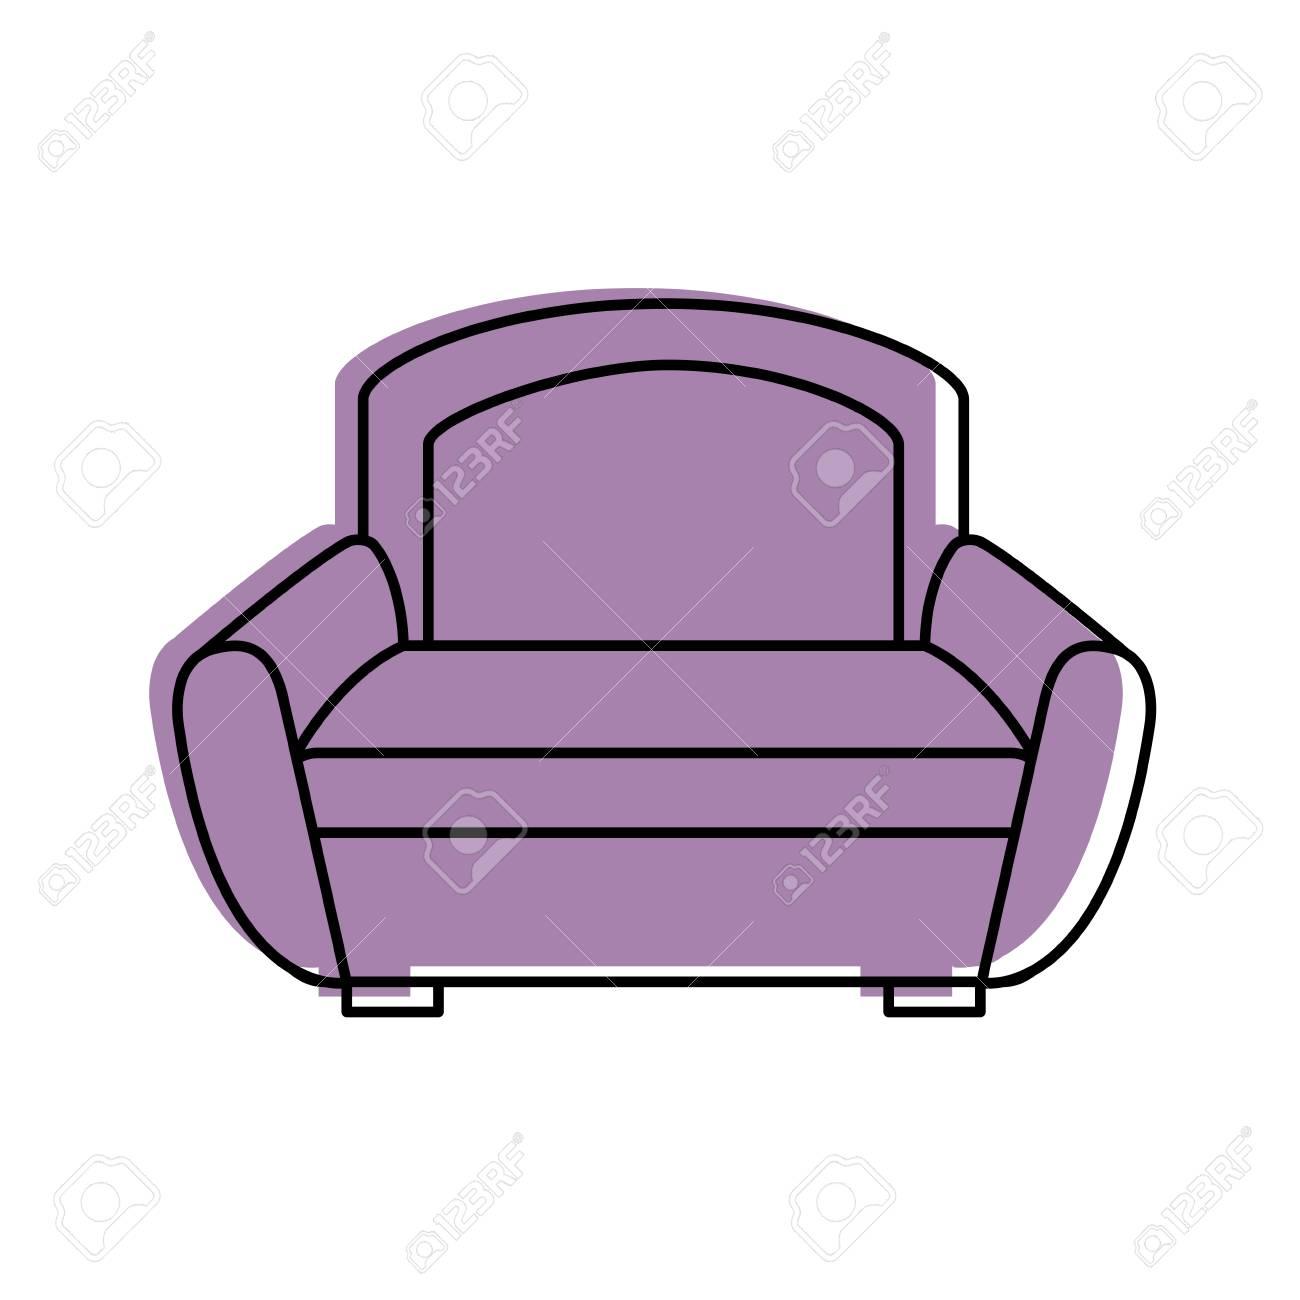 Cartoon Illustration Of Sofa Furniture Home Decor Comfort Element